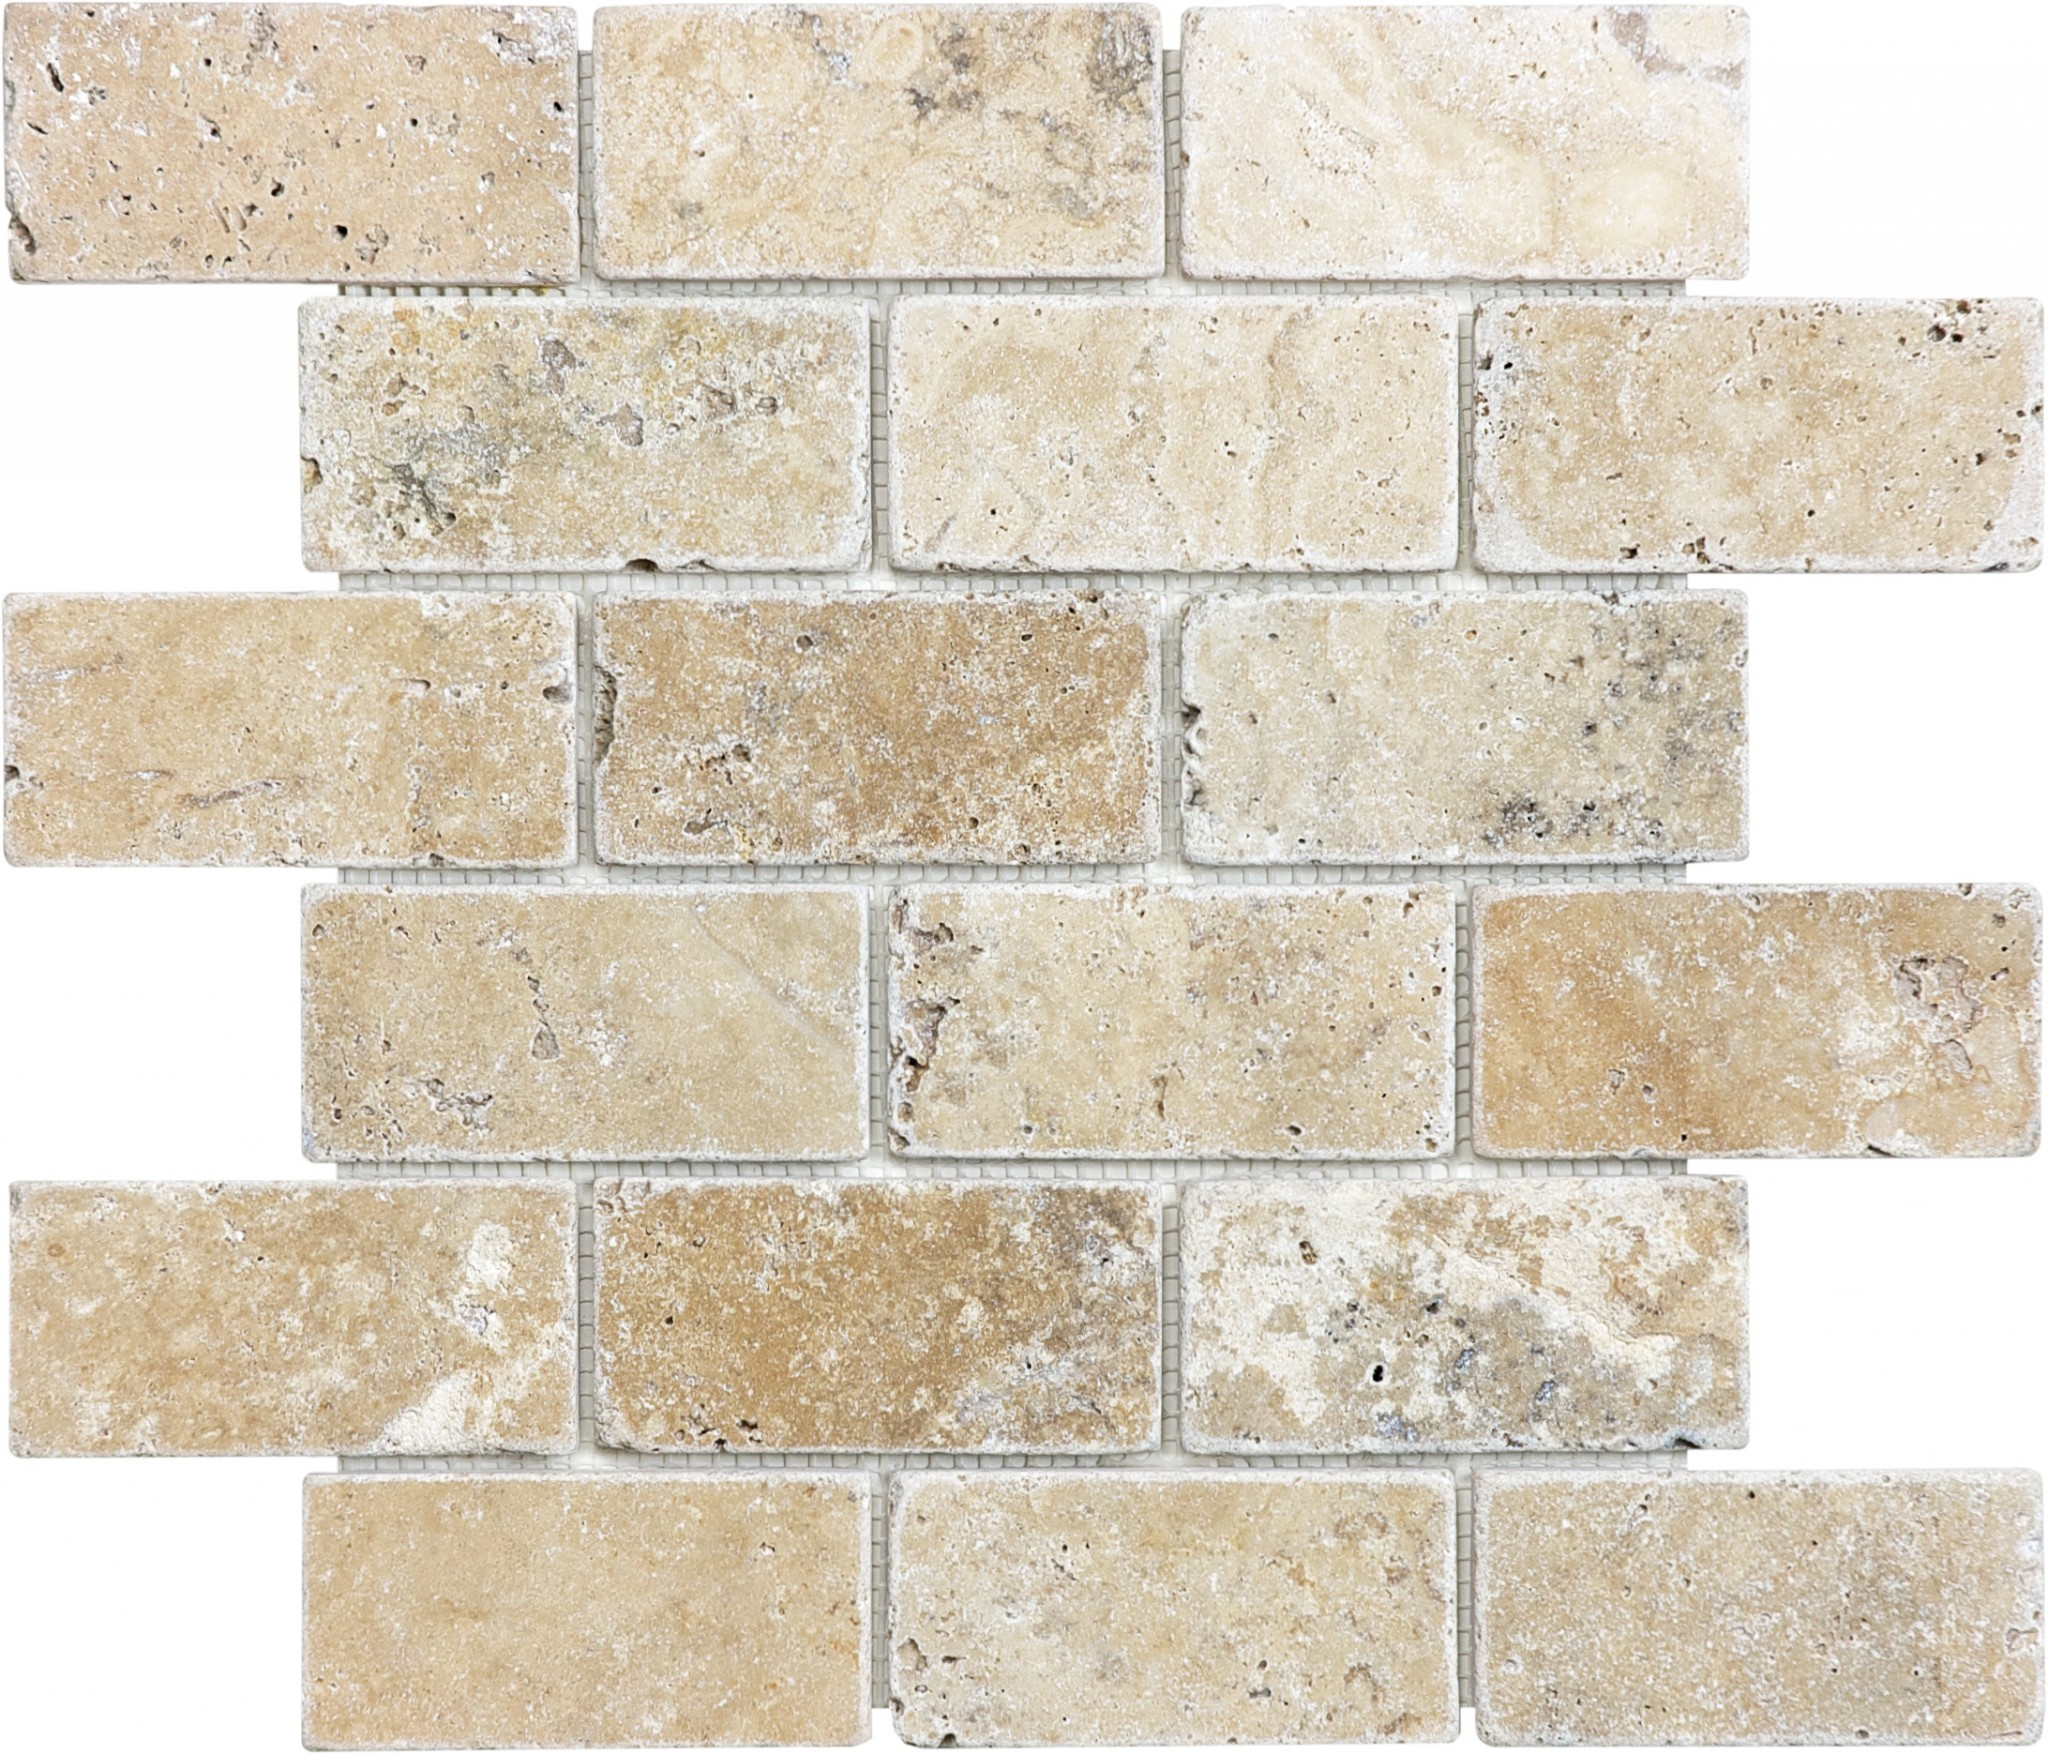 castle picasso travertine - stone solutions